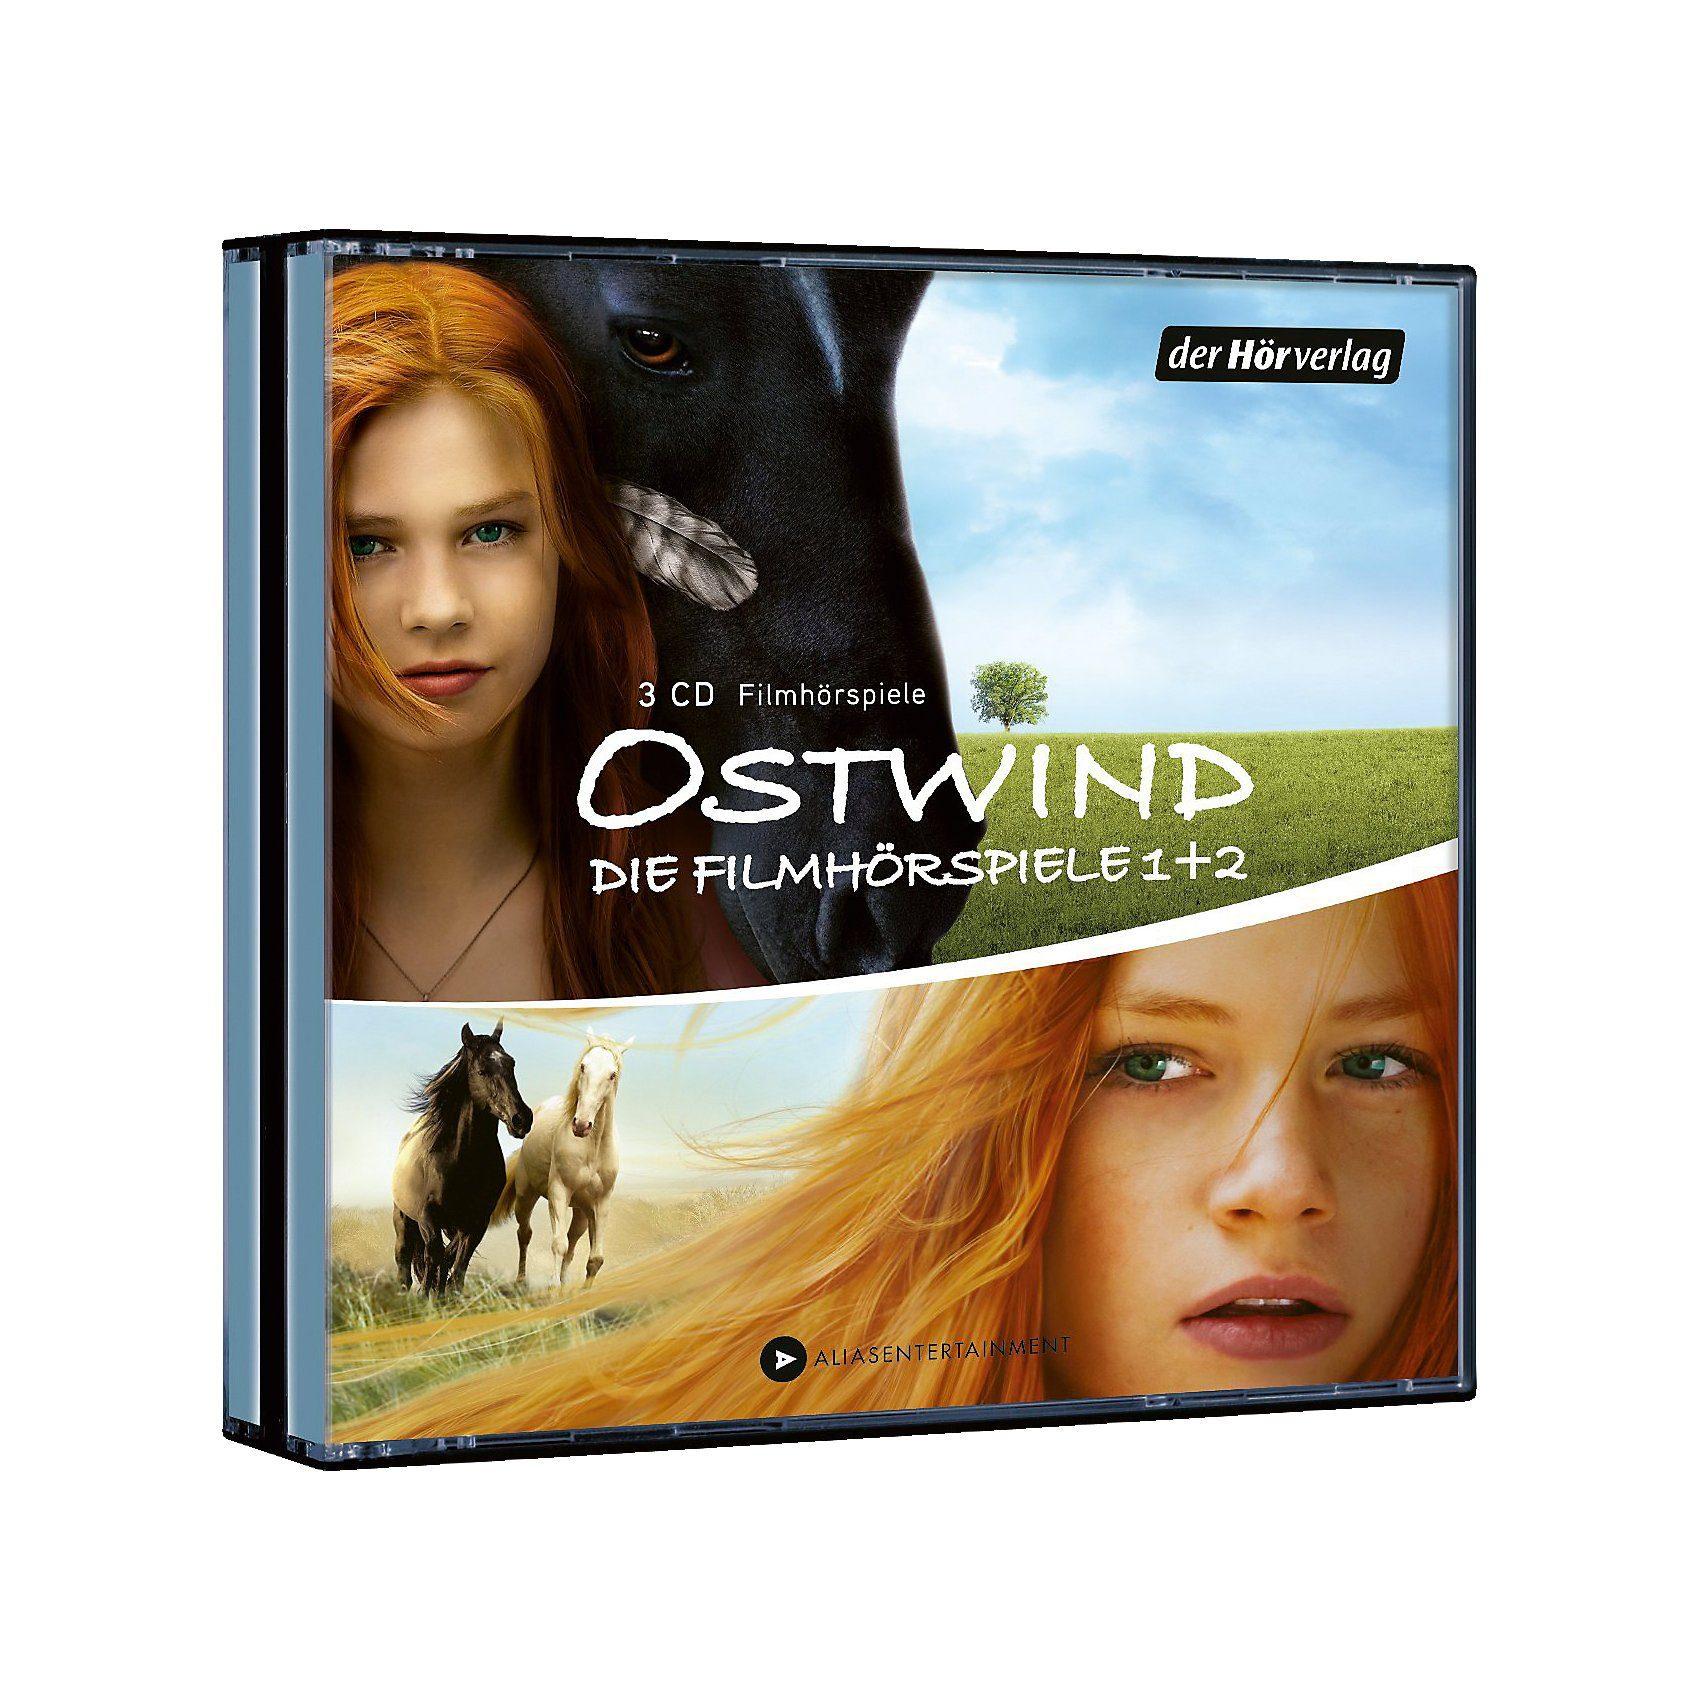 CD Ostwind Filmhörspiele 1 + 2 (3 CDs)